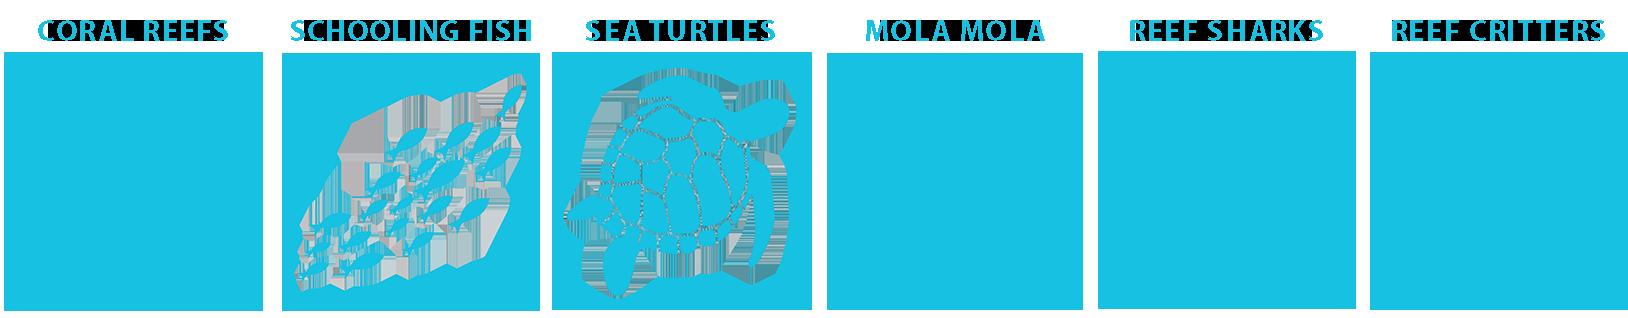 marine life guide alor